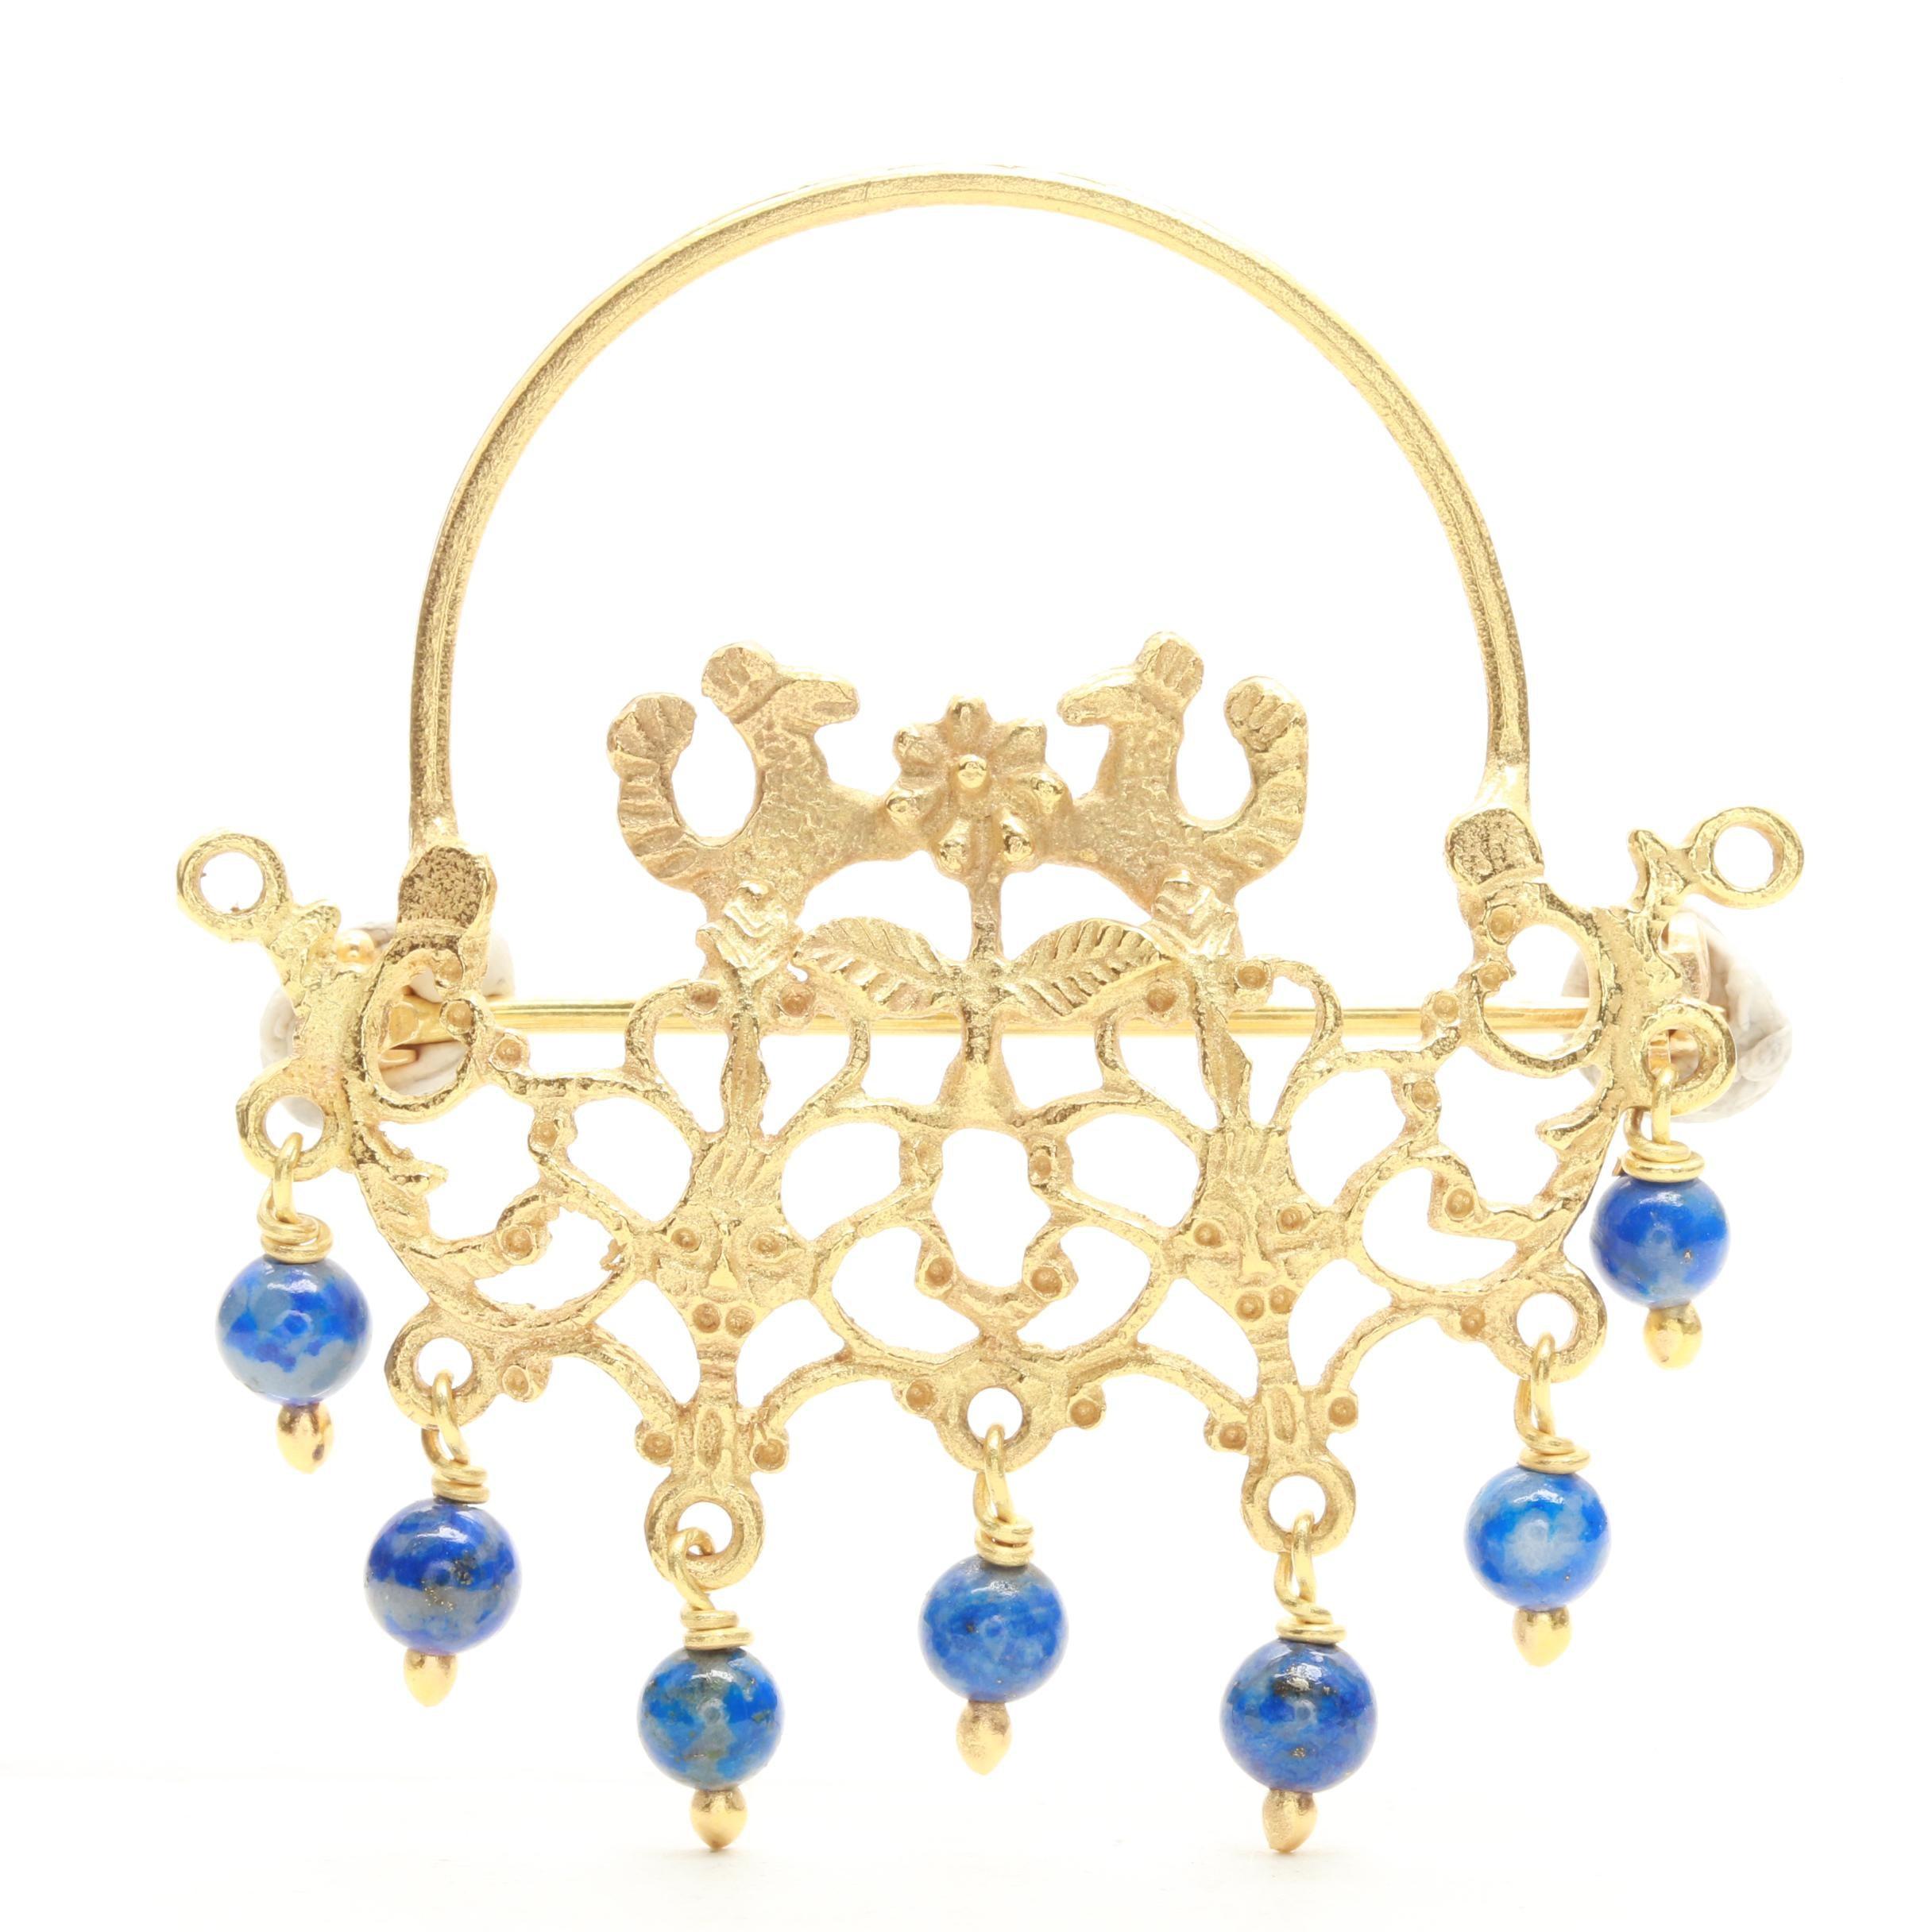 18K Yellow Gold Lapis Lazuli Beaded Openwork Brooch